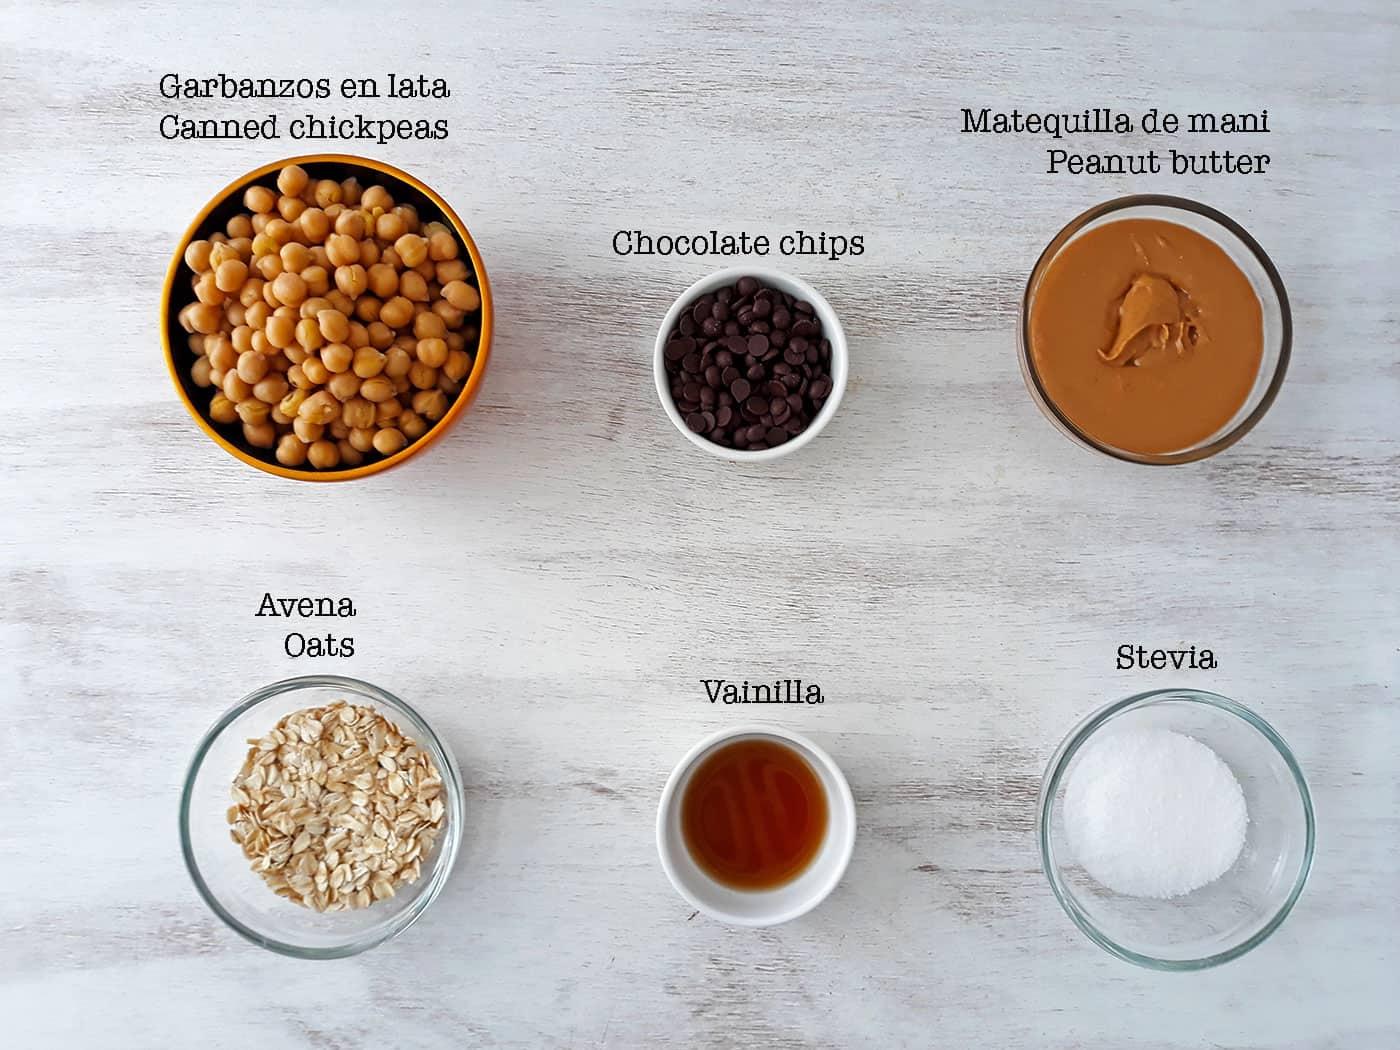 ingredientes para preparar bolitas de proteína.